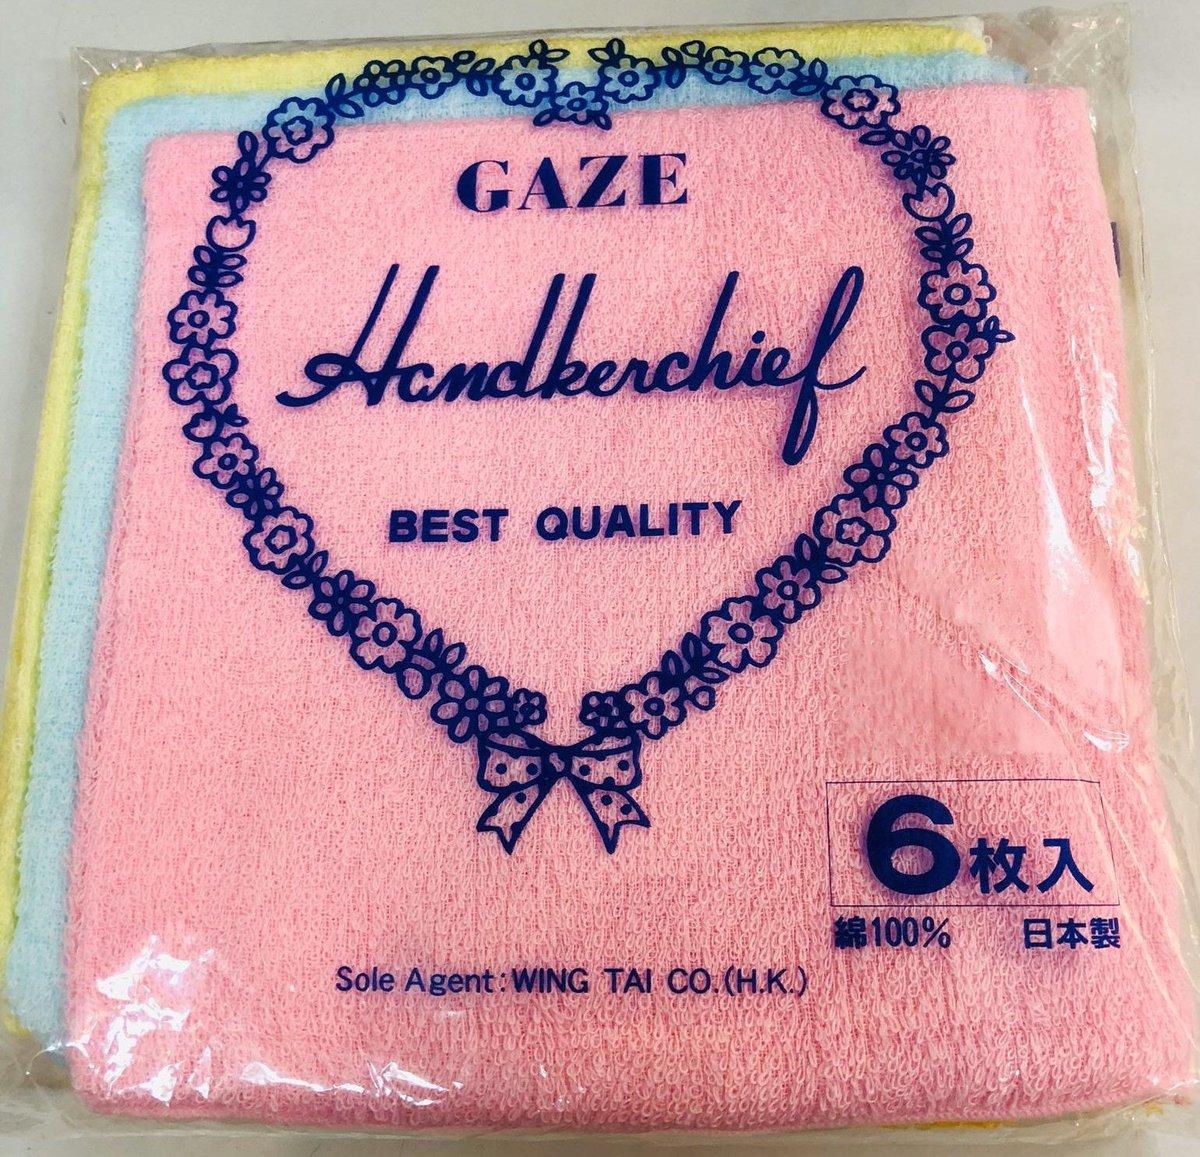 Gaze Handkerchief